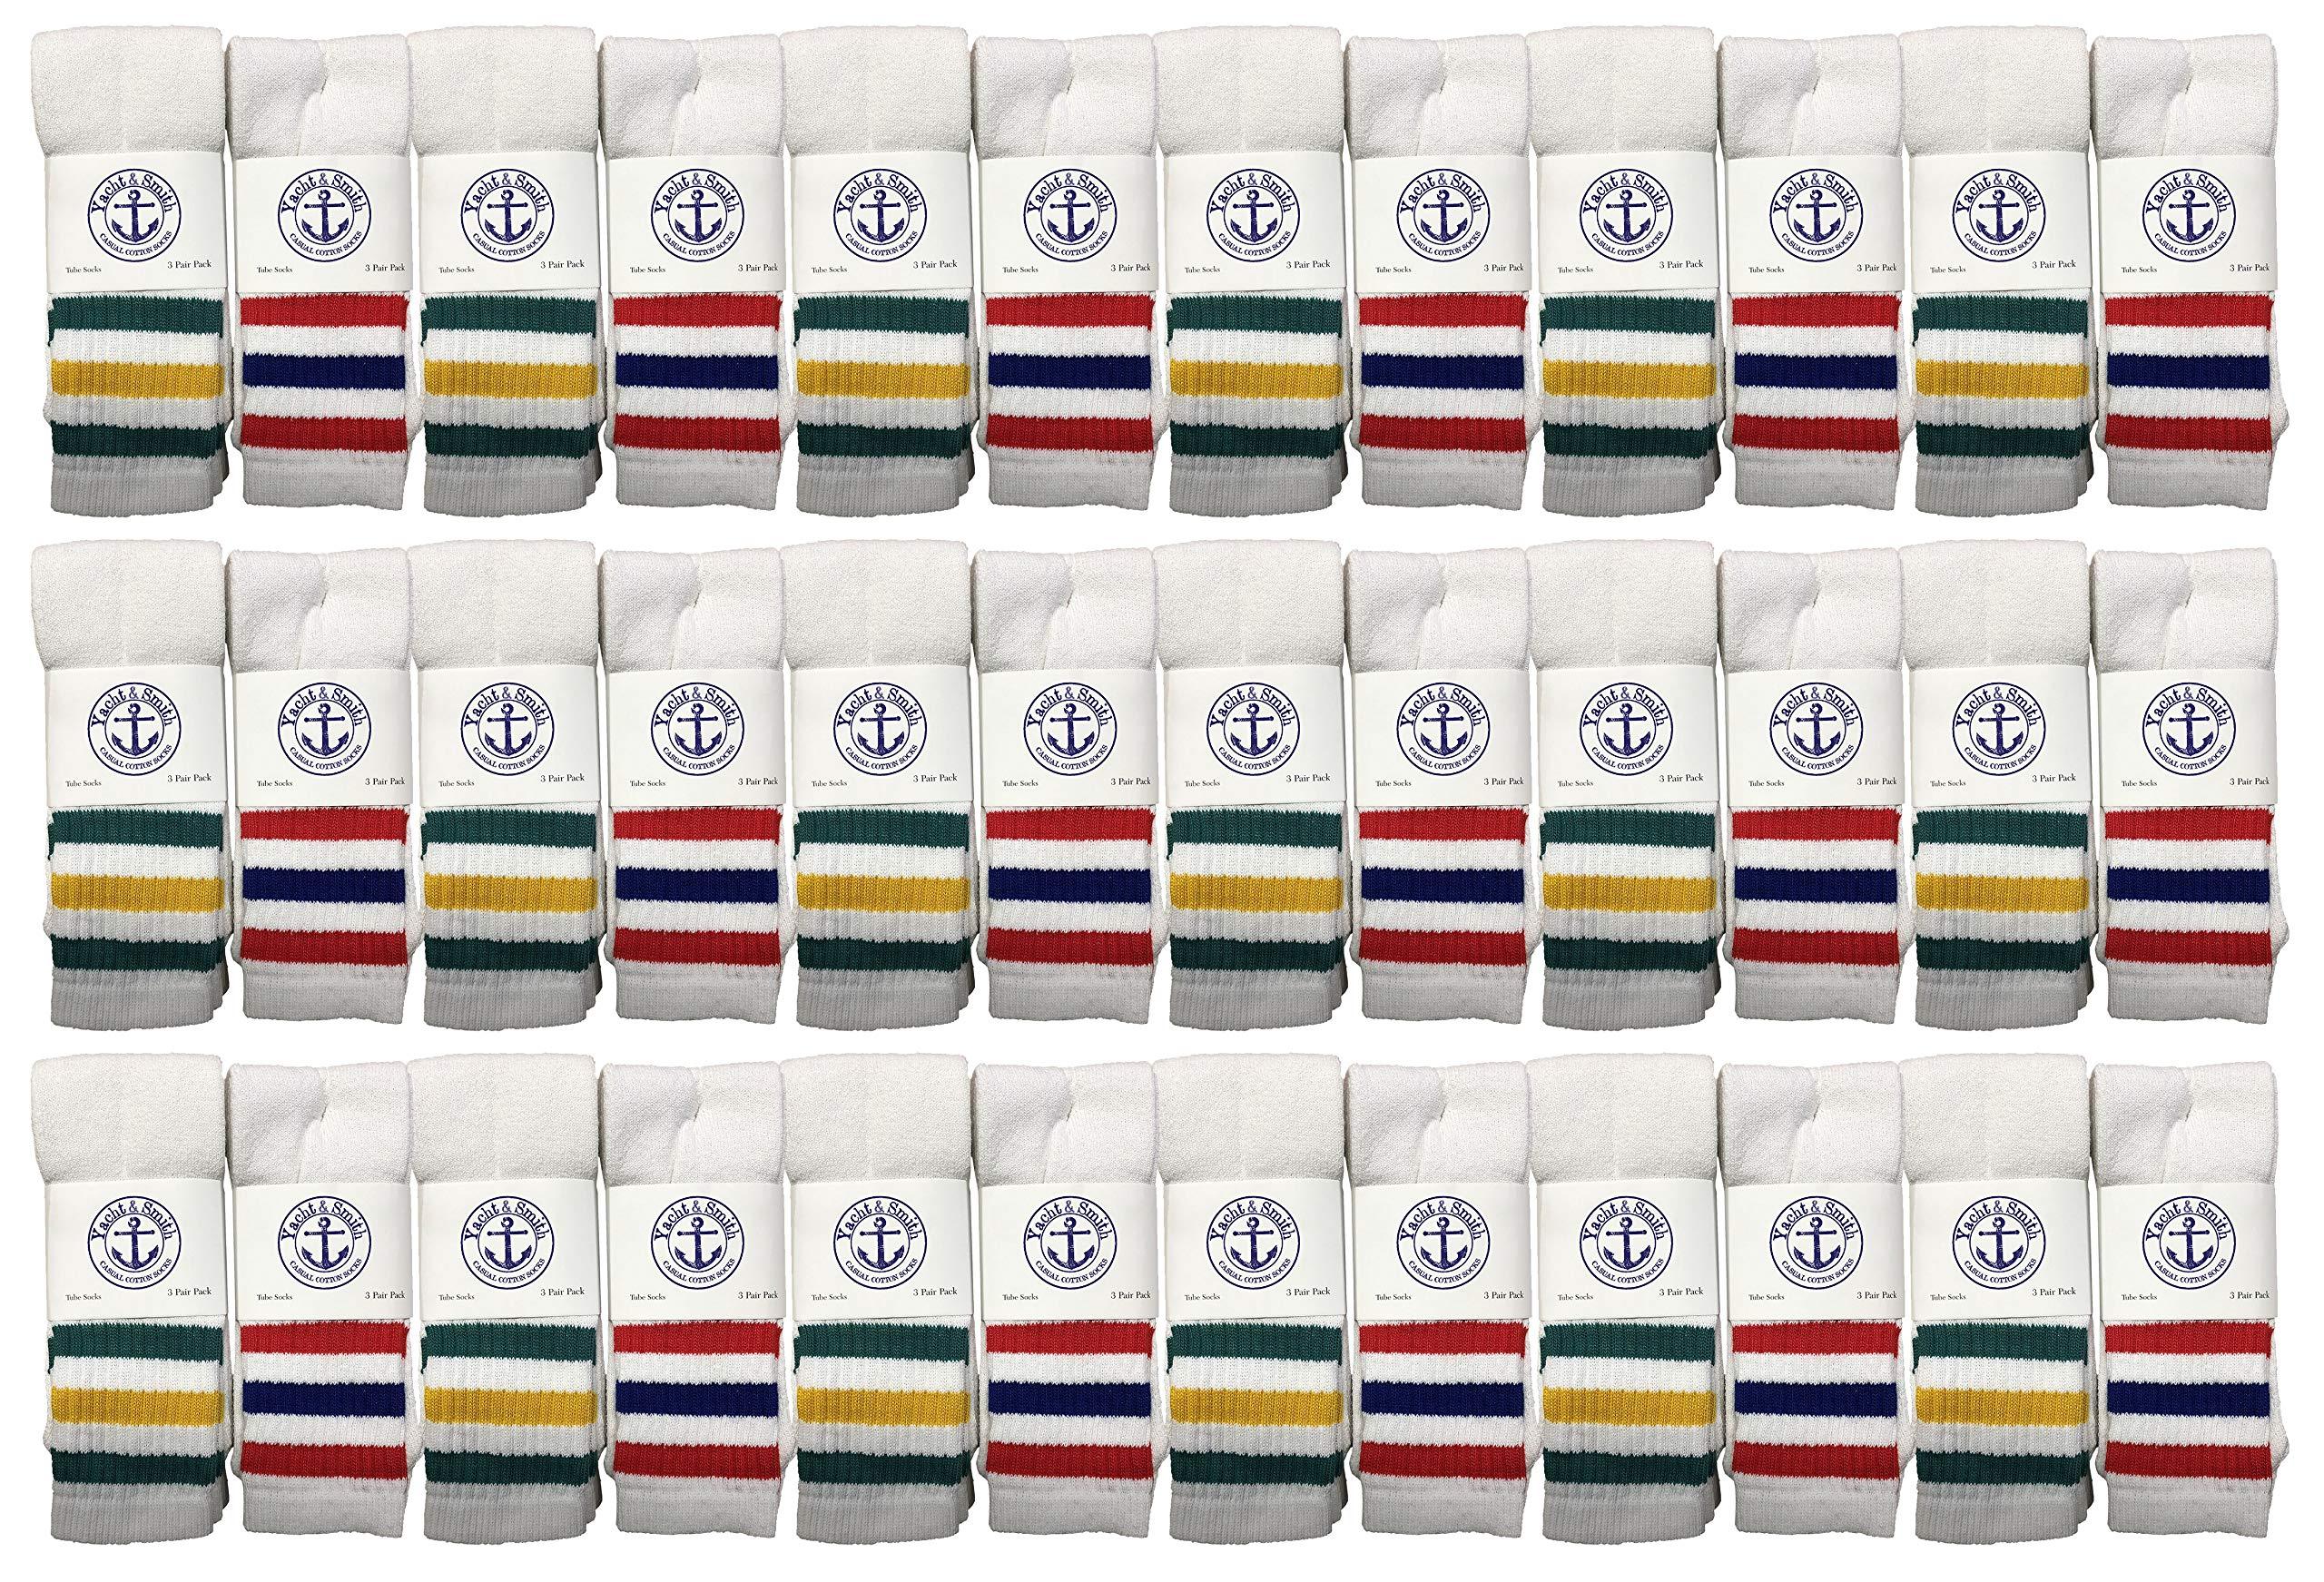 Yacht & Smith Wholesale Kids Tube Socks, Cotton Bulk Sport Socks Size 4-13 by Yacht & Smith